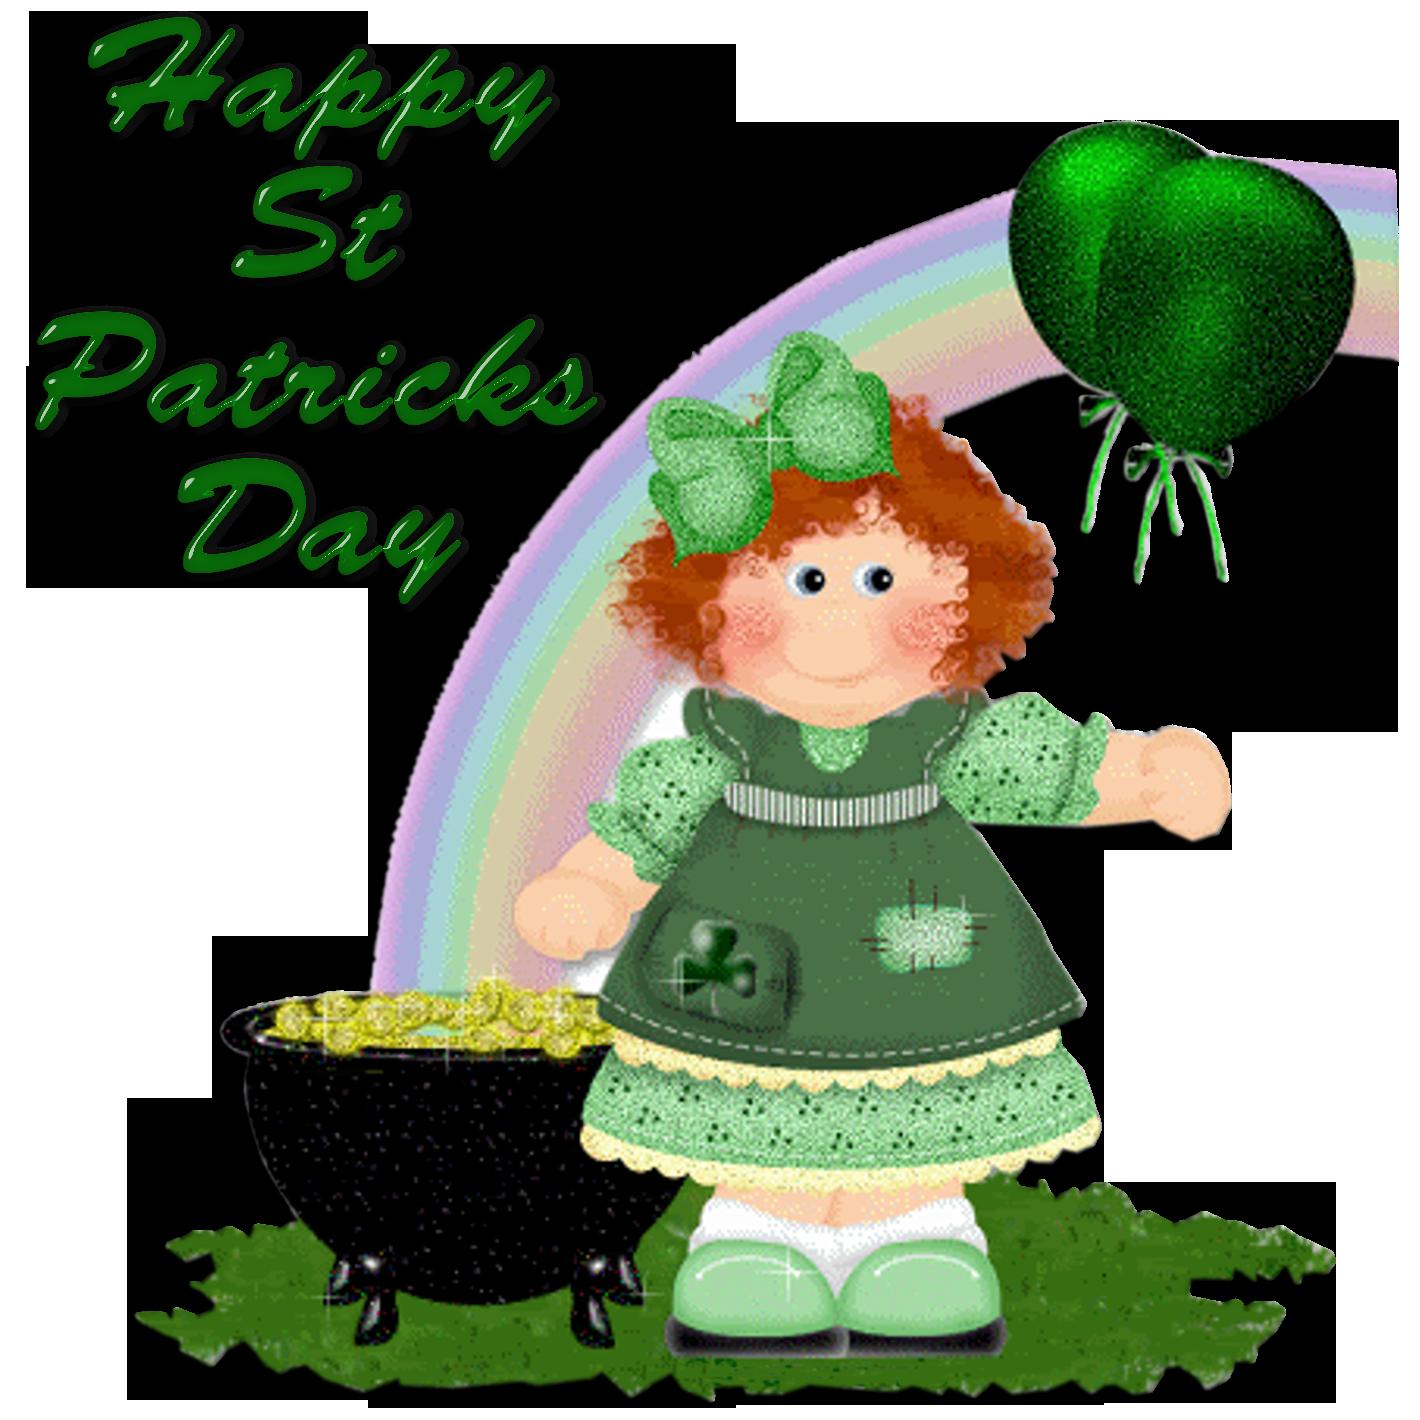 St Patricks Day Graphics - ClipArt Best